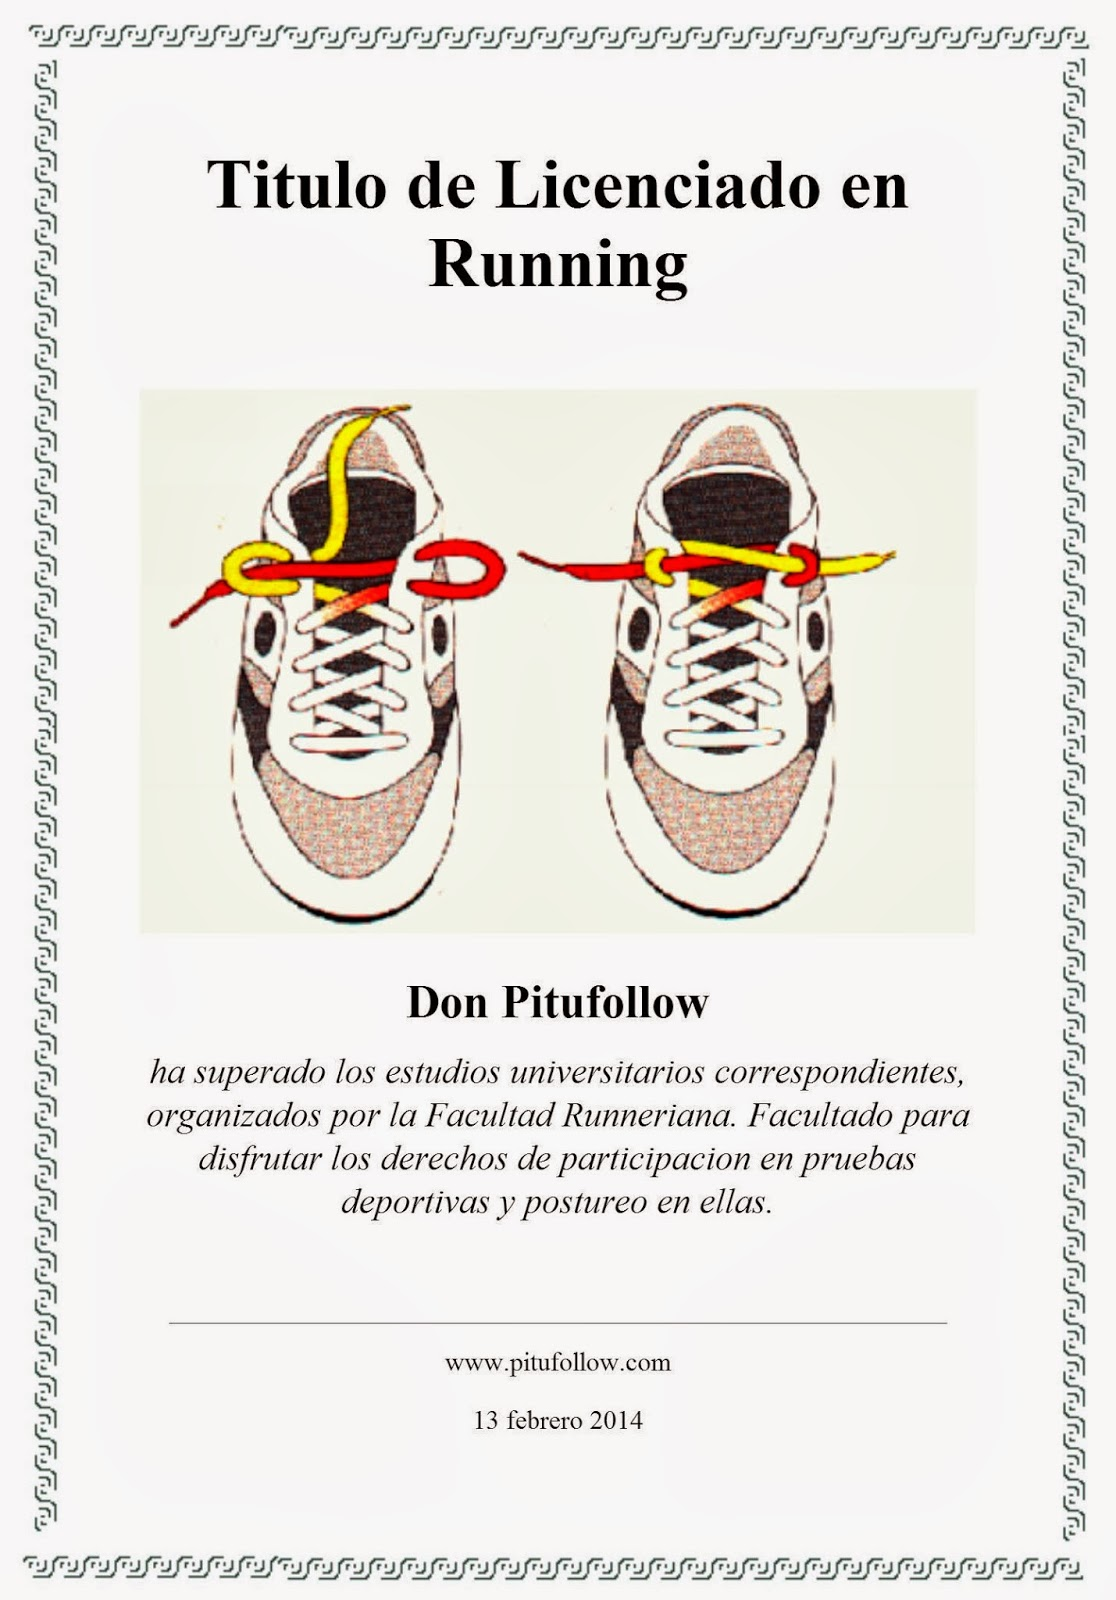 diploma licenciatura running curso corredor pitufollow